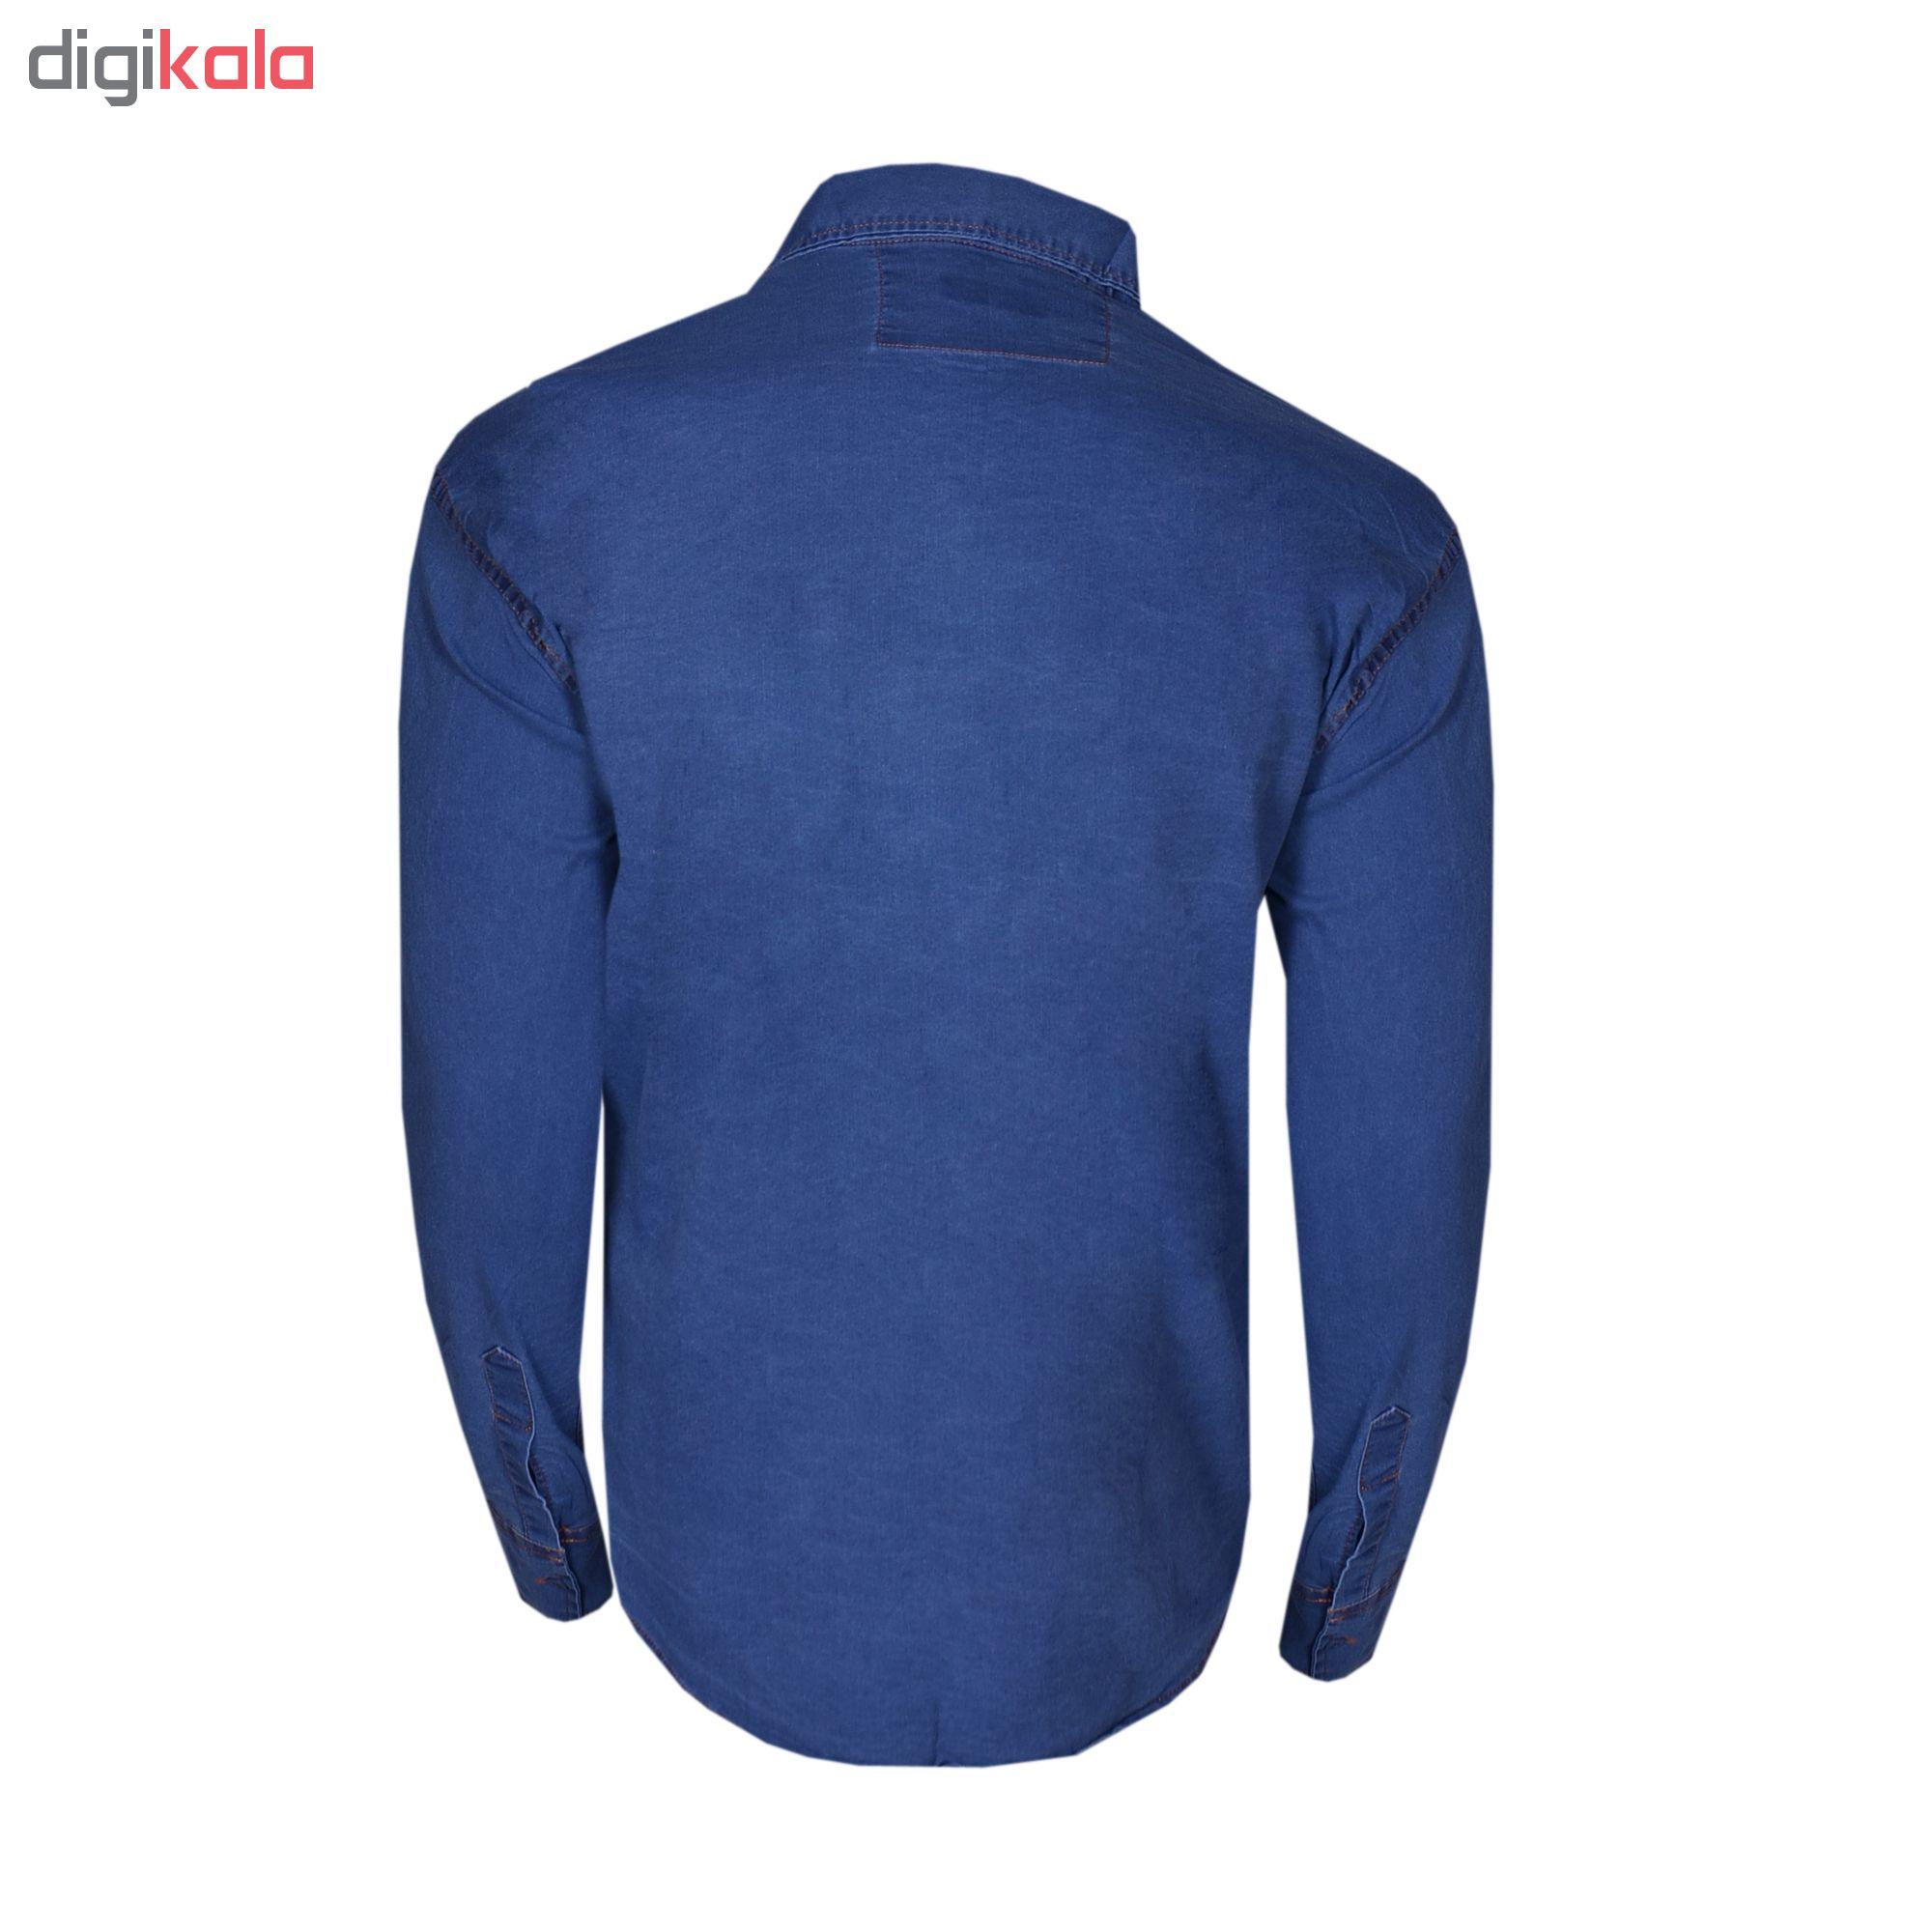 پیراهن مردانه کد 24-834